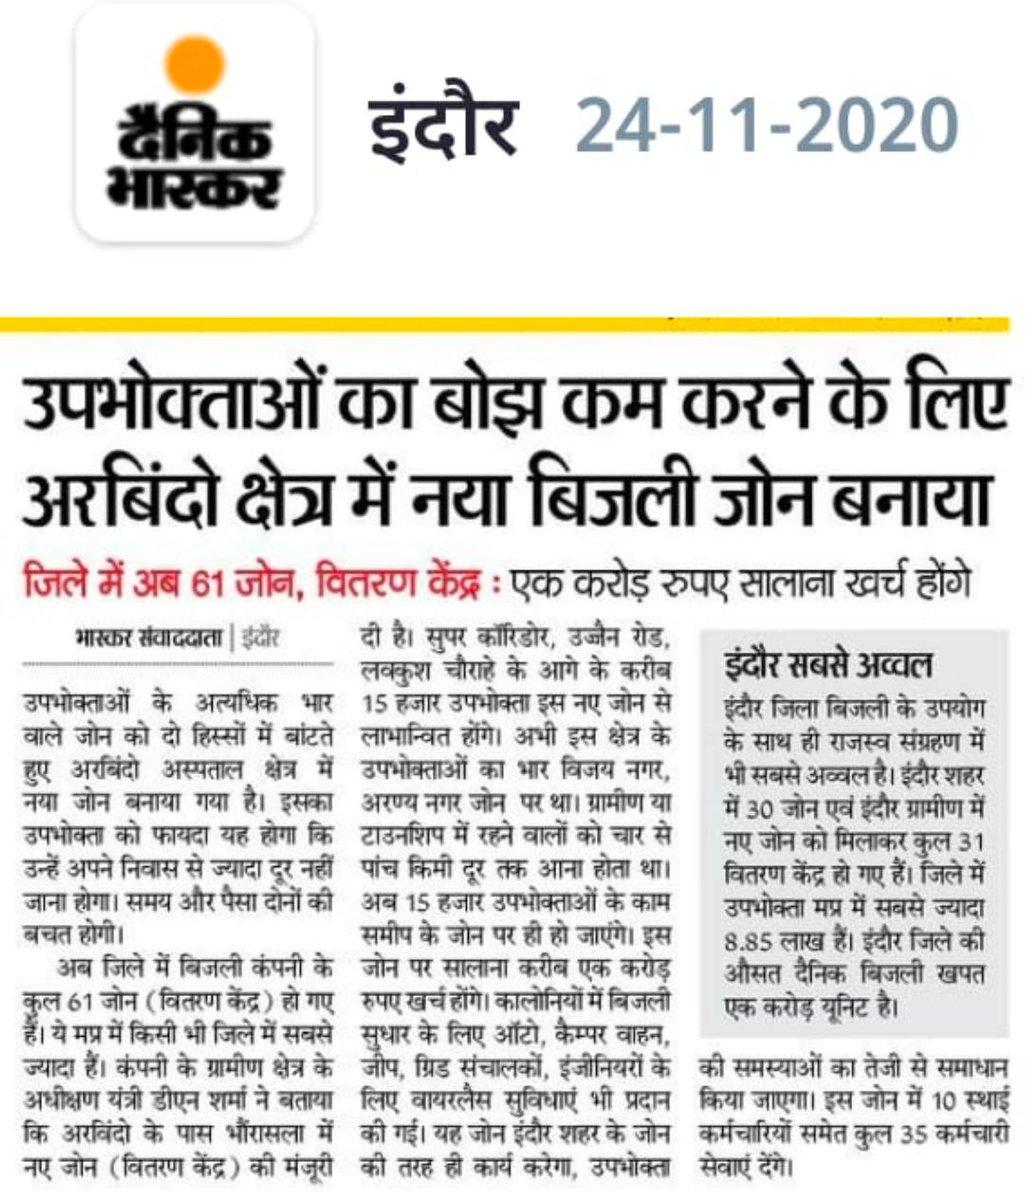 #Consumer  #Bhawrasla  #DistributionCenter #UjjainRoad #WestDiscom #Mppkvvcl #Mpeb #Indore